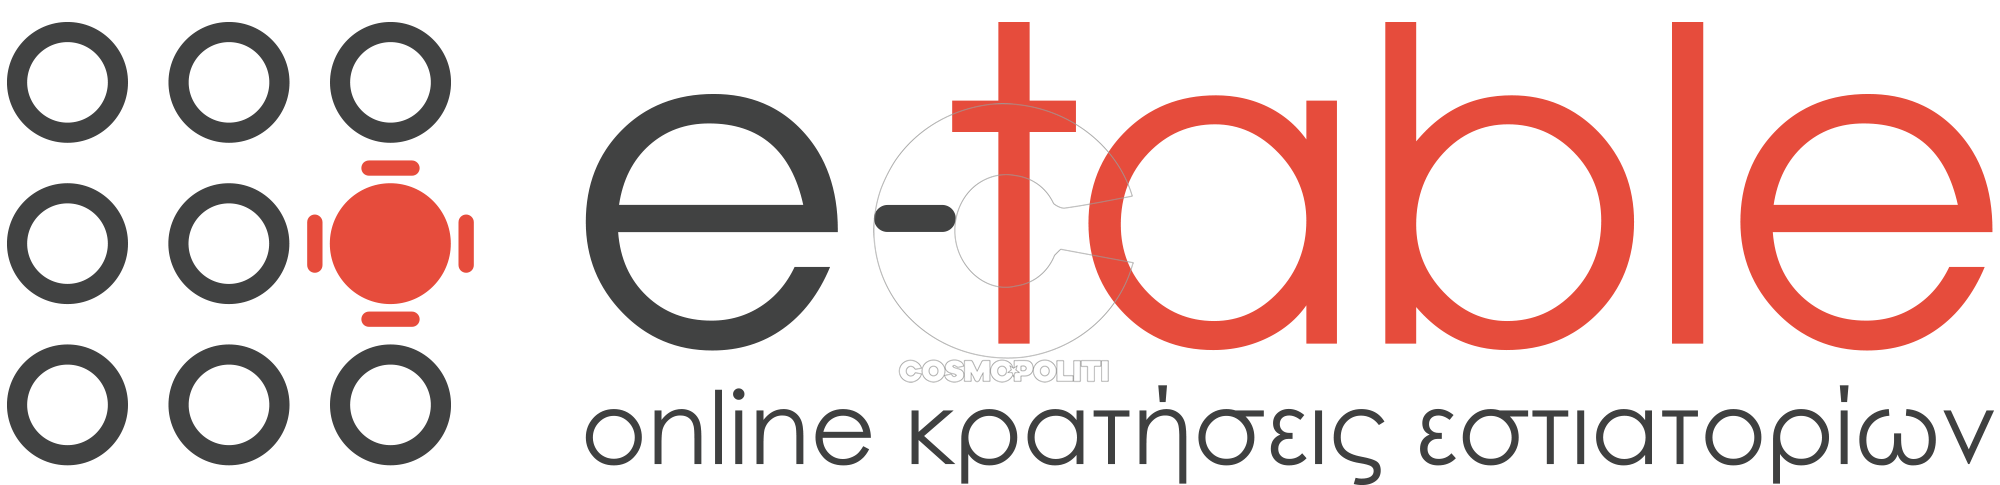 etable logo